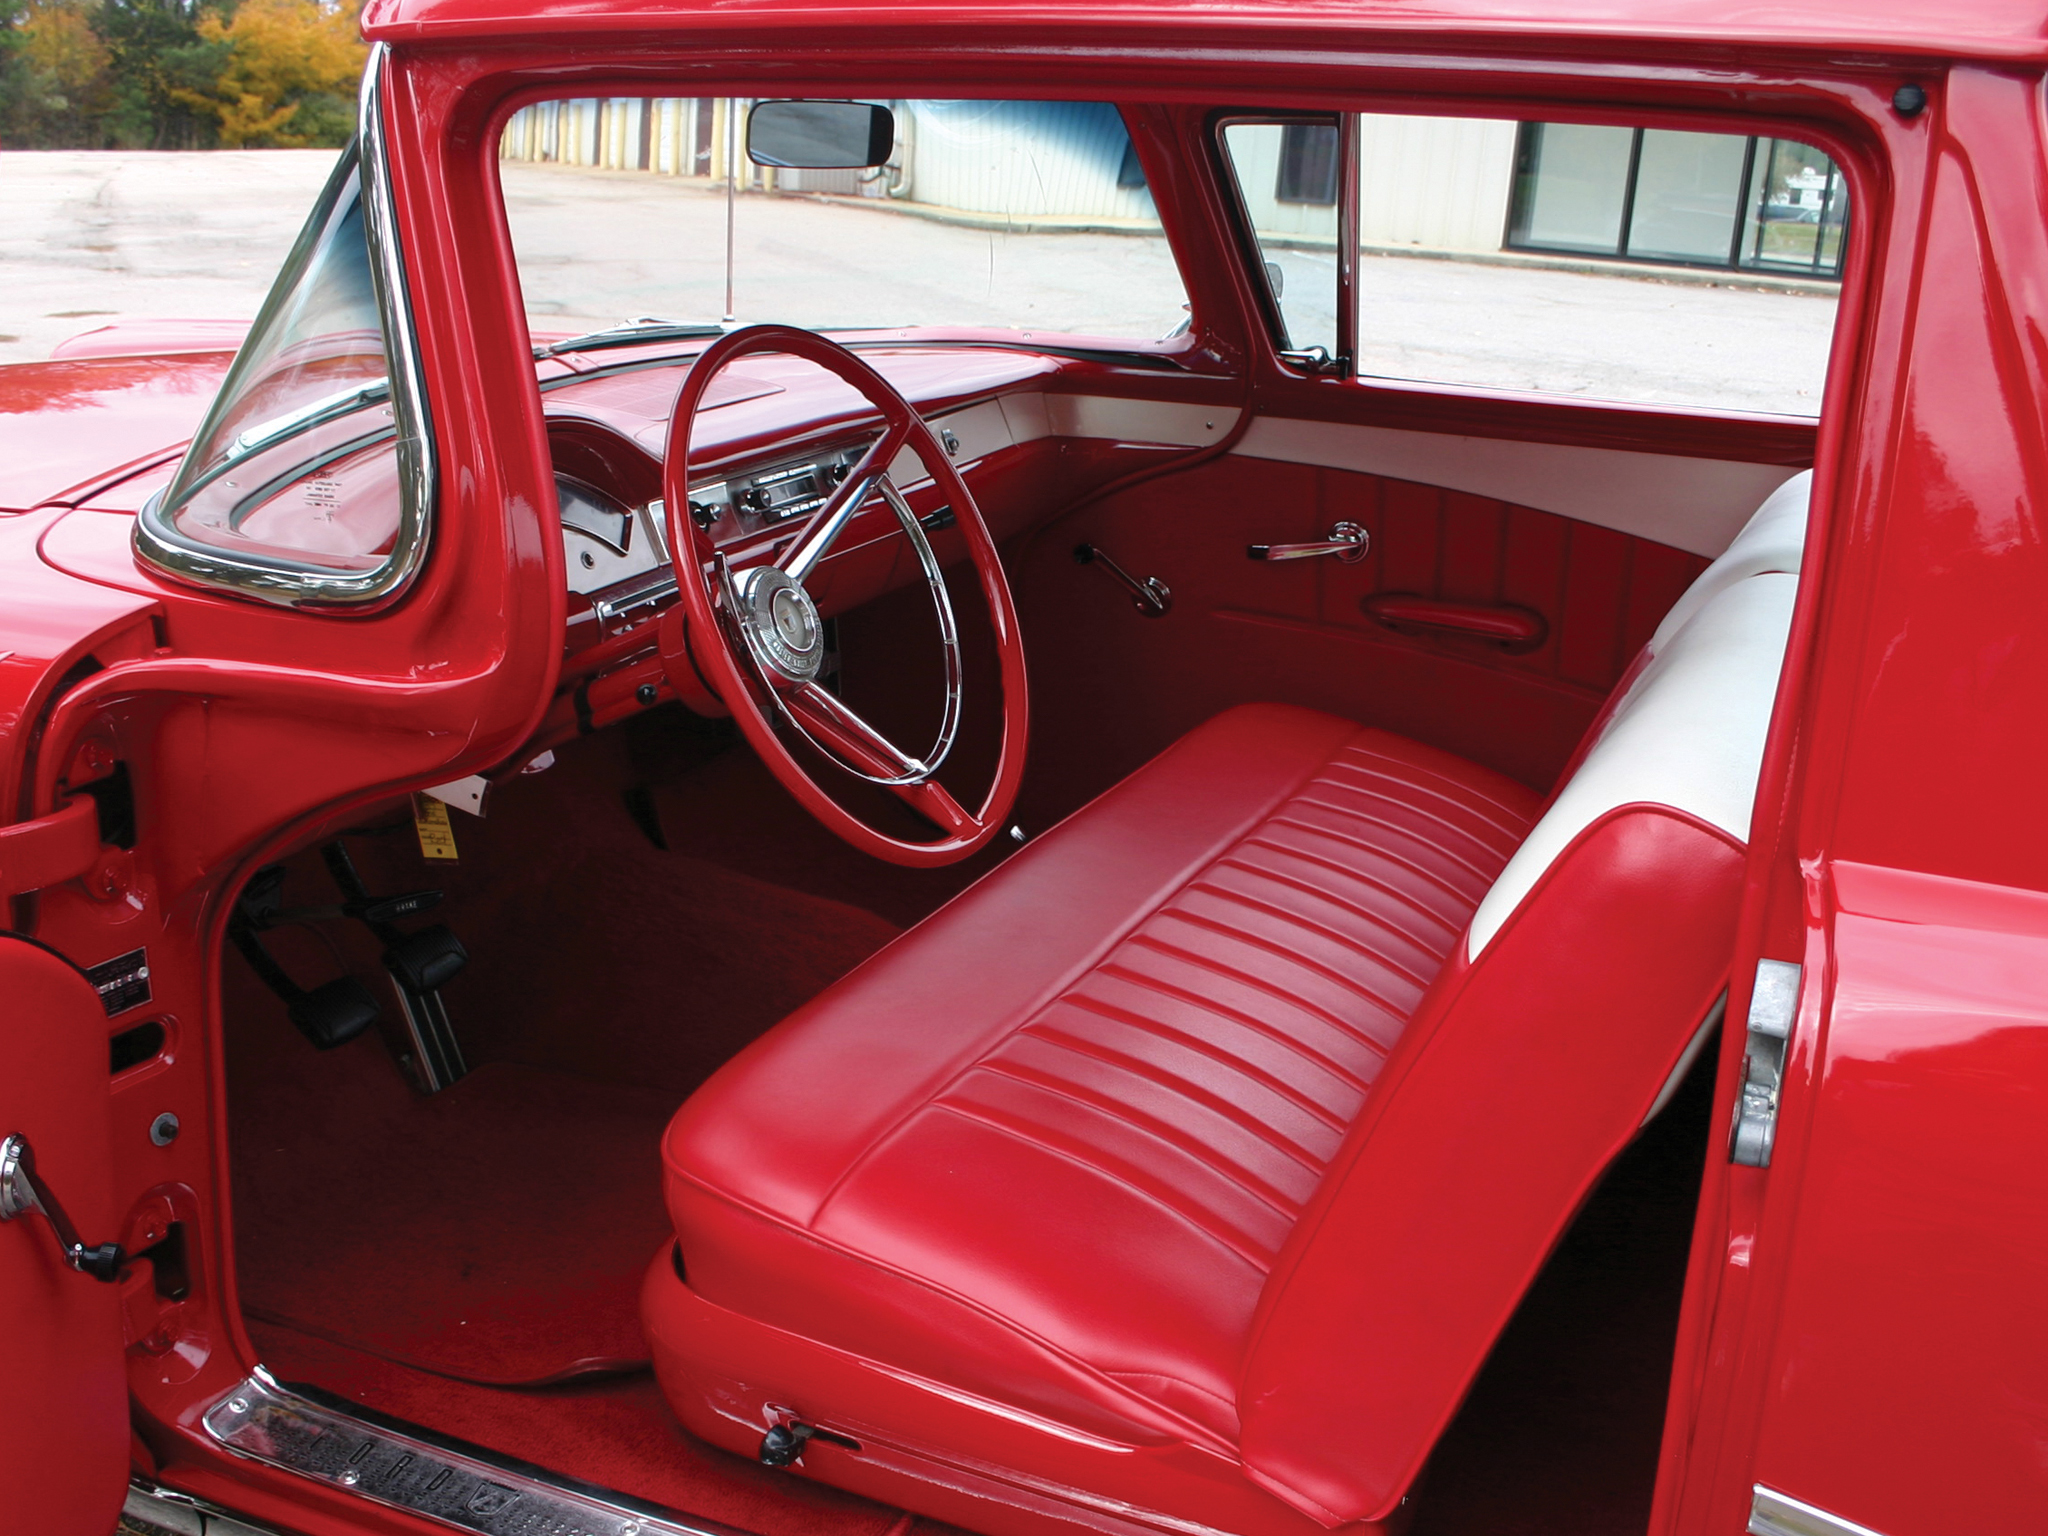 1957 ford ranchero custom pickup retro interior g wallpaper 2048x1536 142325 wallpaperup